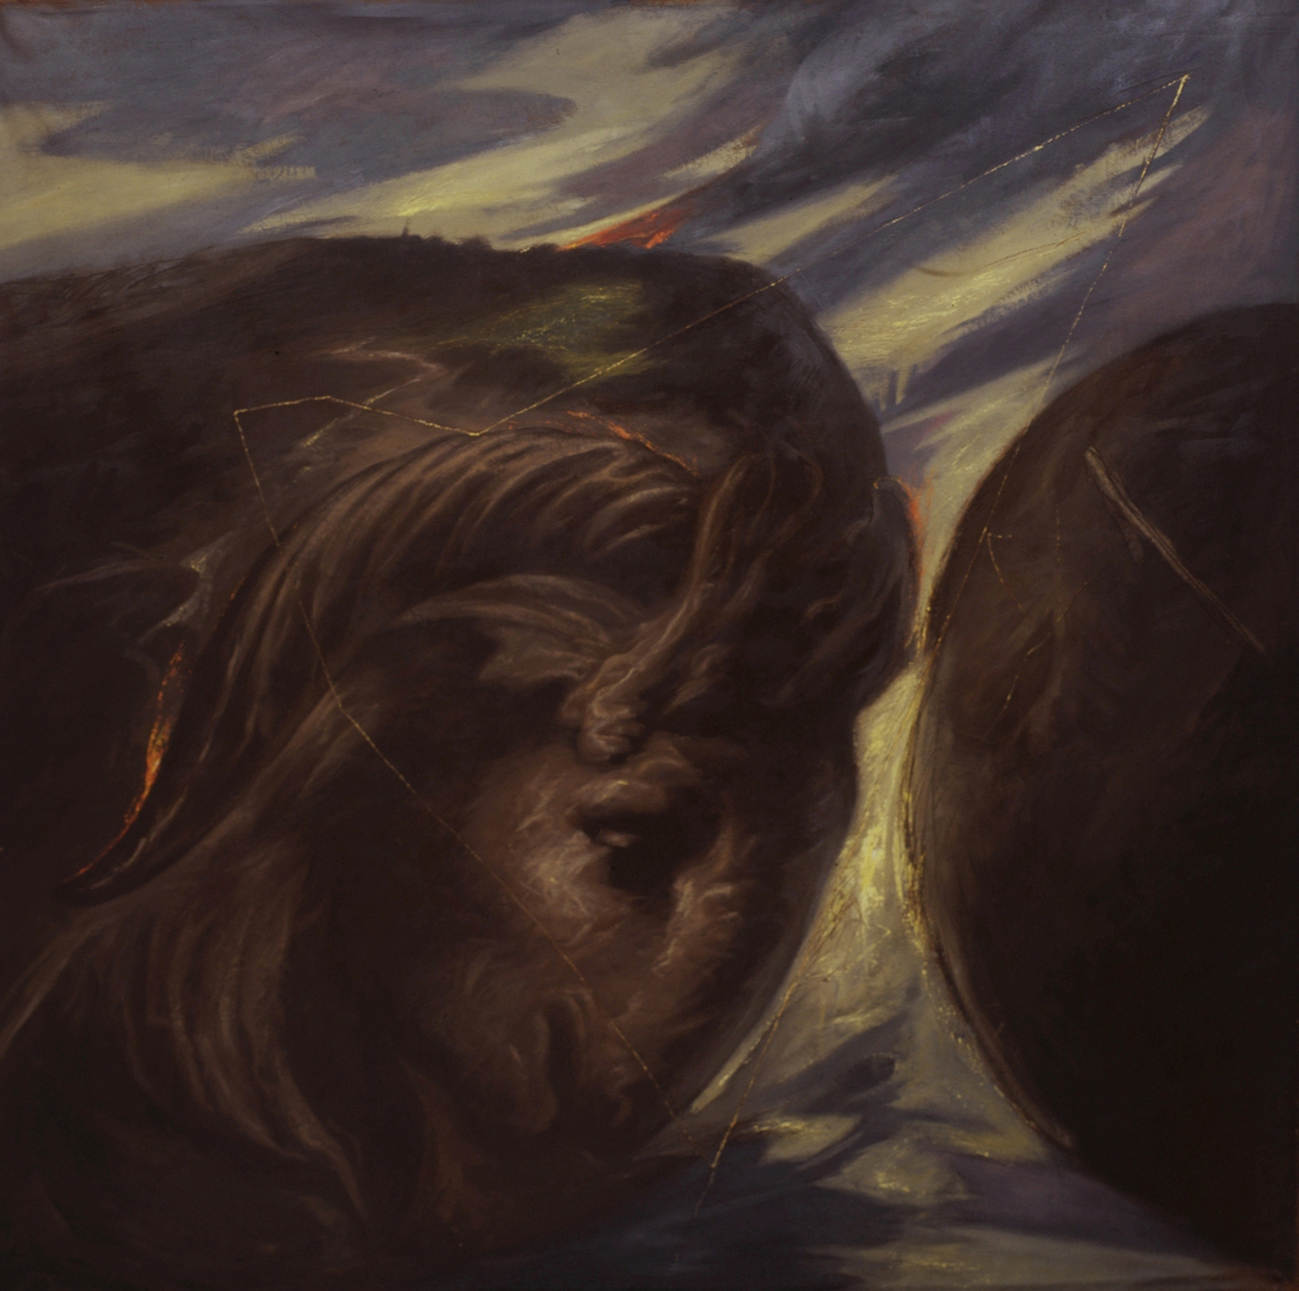 Omar Galliani, Terreo Vello d'Oriente,1984,olio su tela,cm 200x200